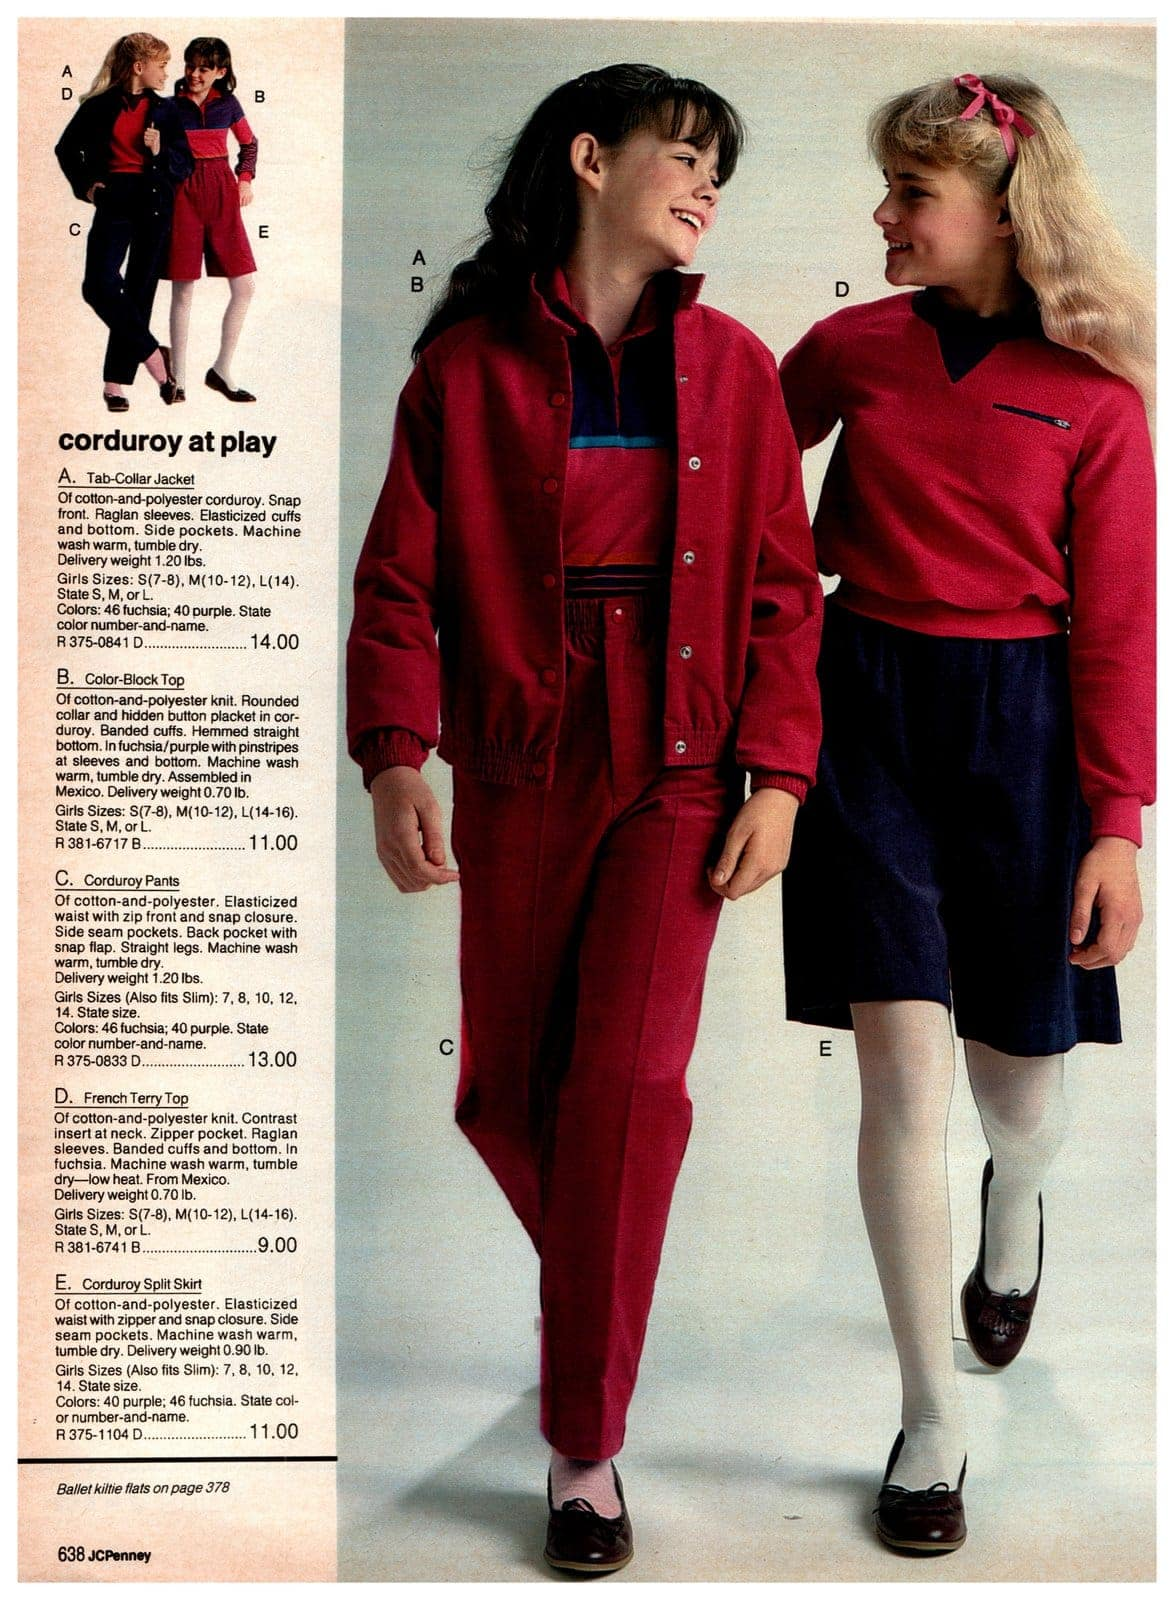 Corduroy separates for girls - jackets, tops, pants, split skirts